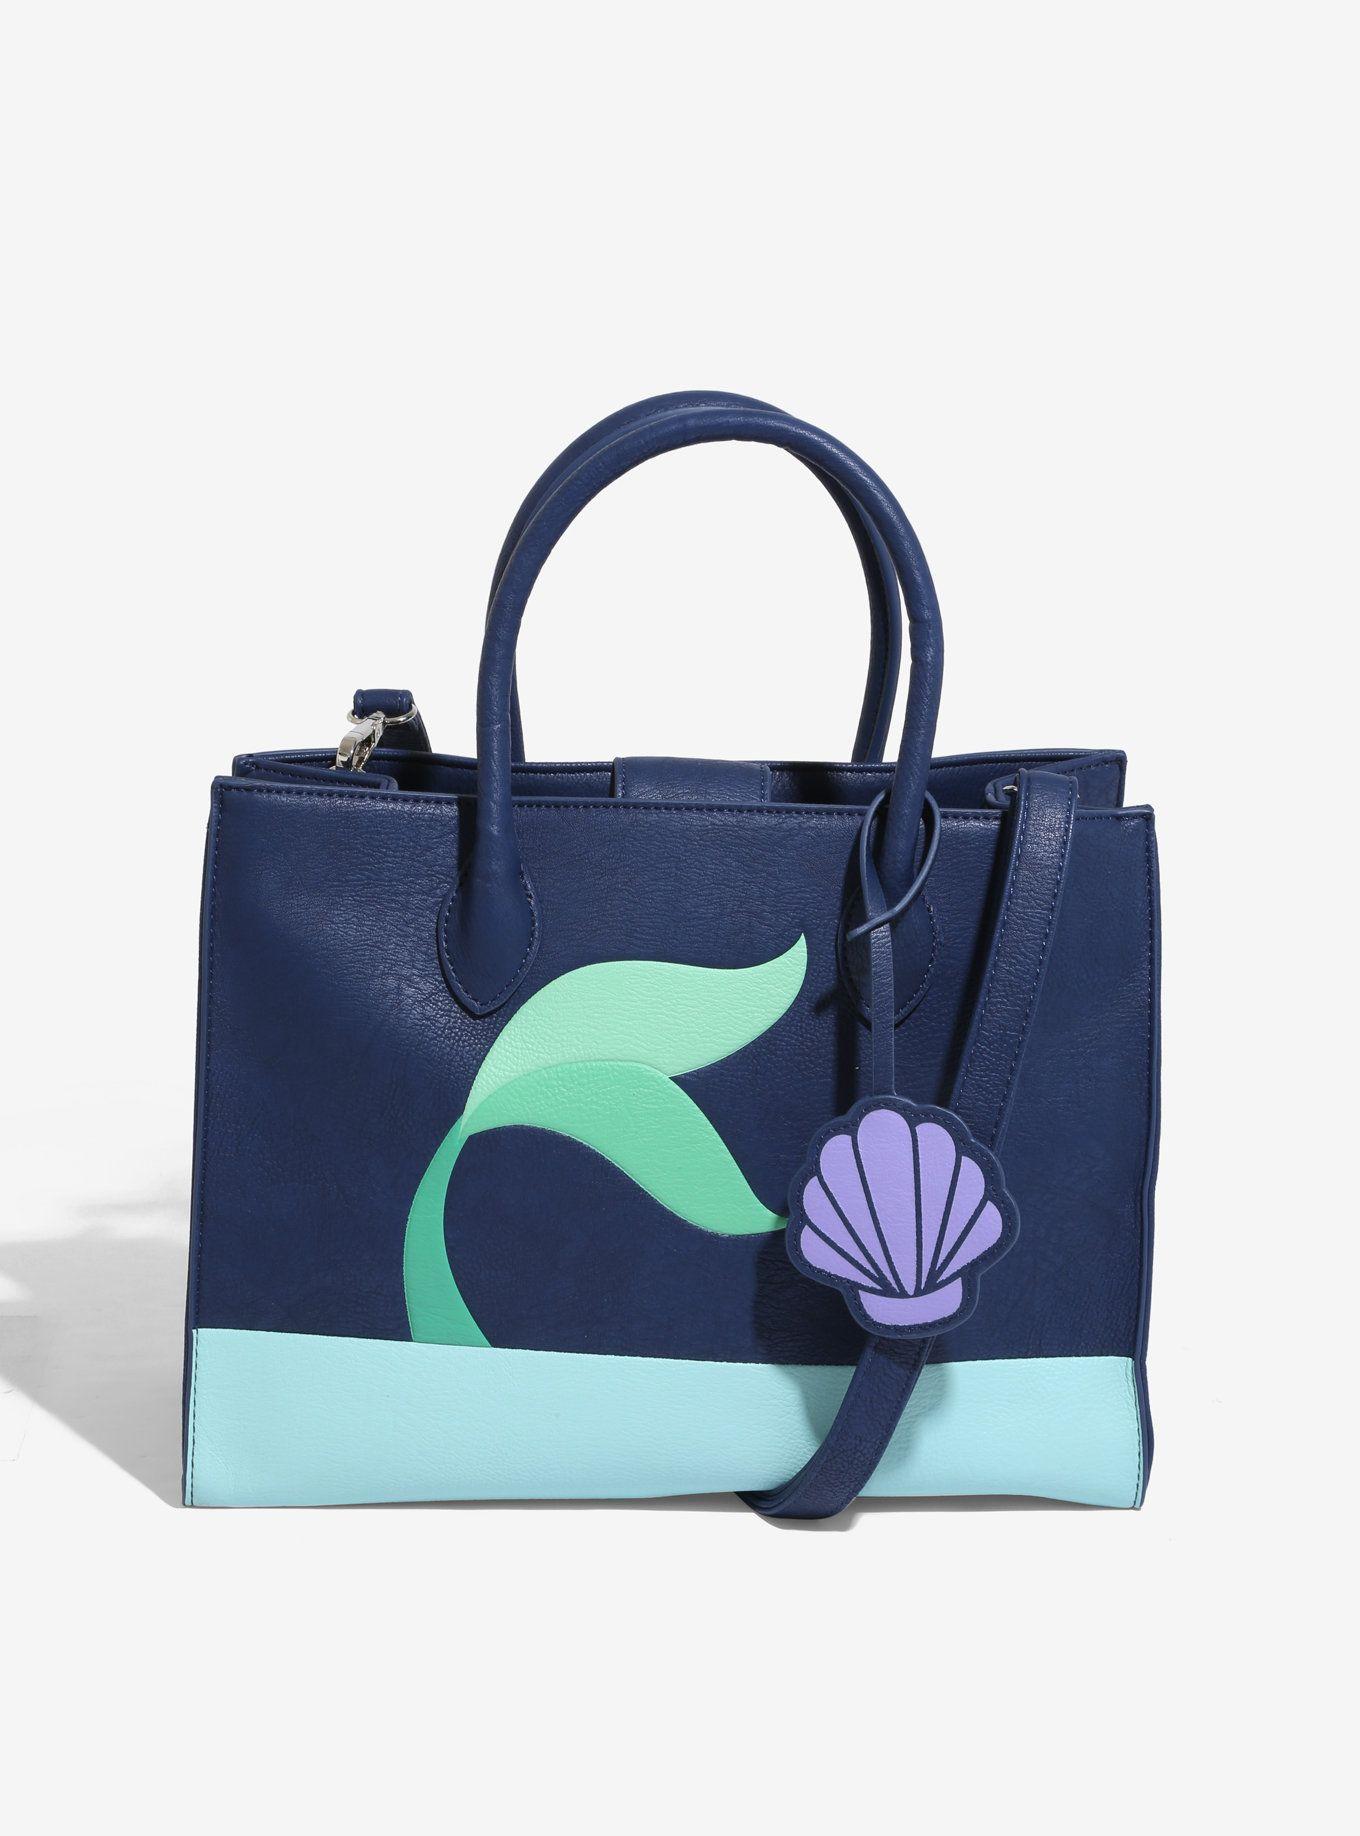 Splish Splash with the Loungefly Little Mermaid Purse and Wallet ... 0b3b38d05edd1